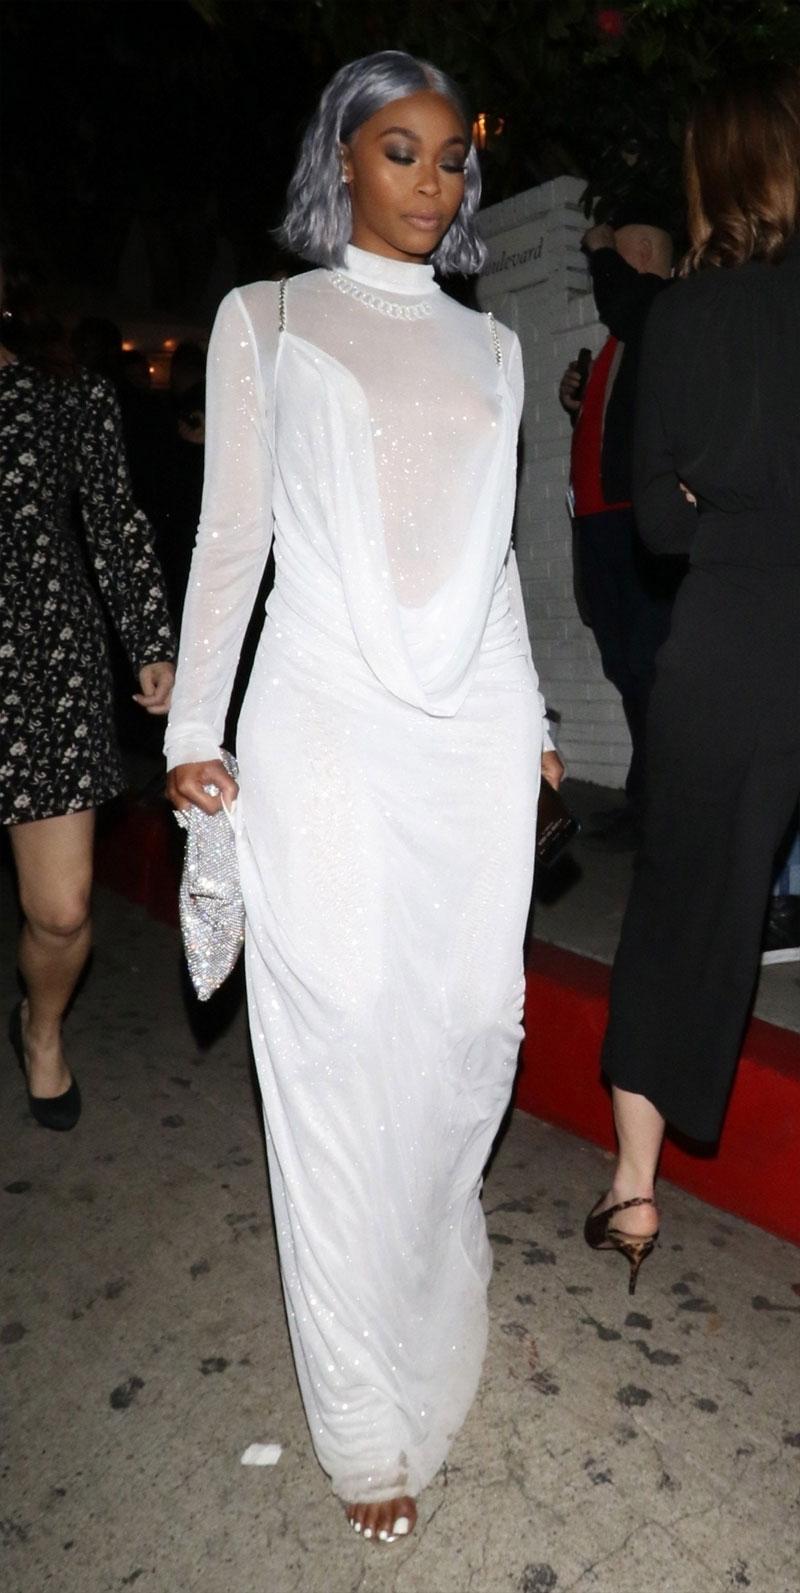 Actress Nafessa Williams Nipple Slips in White Window Dress